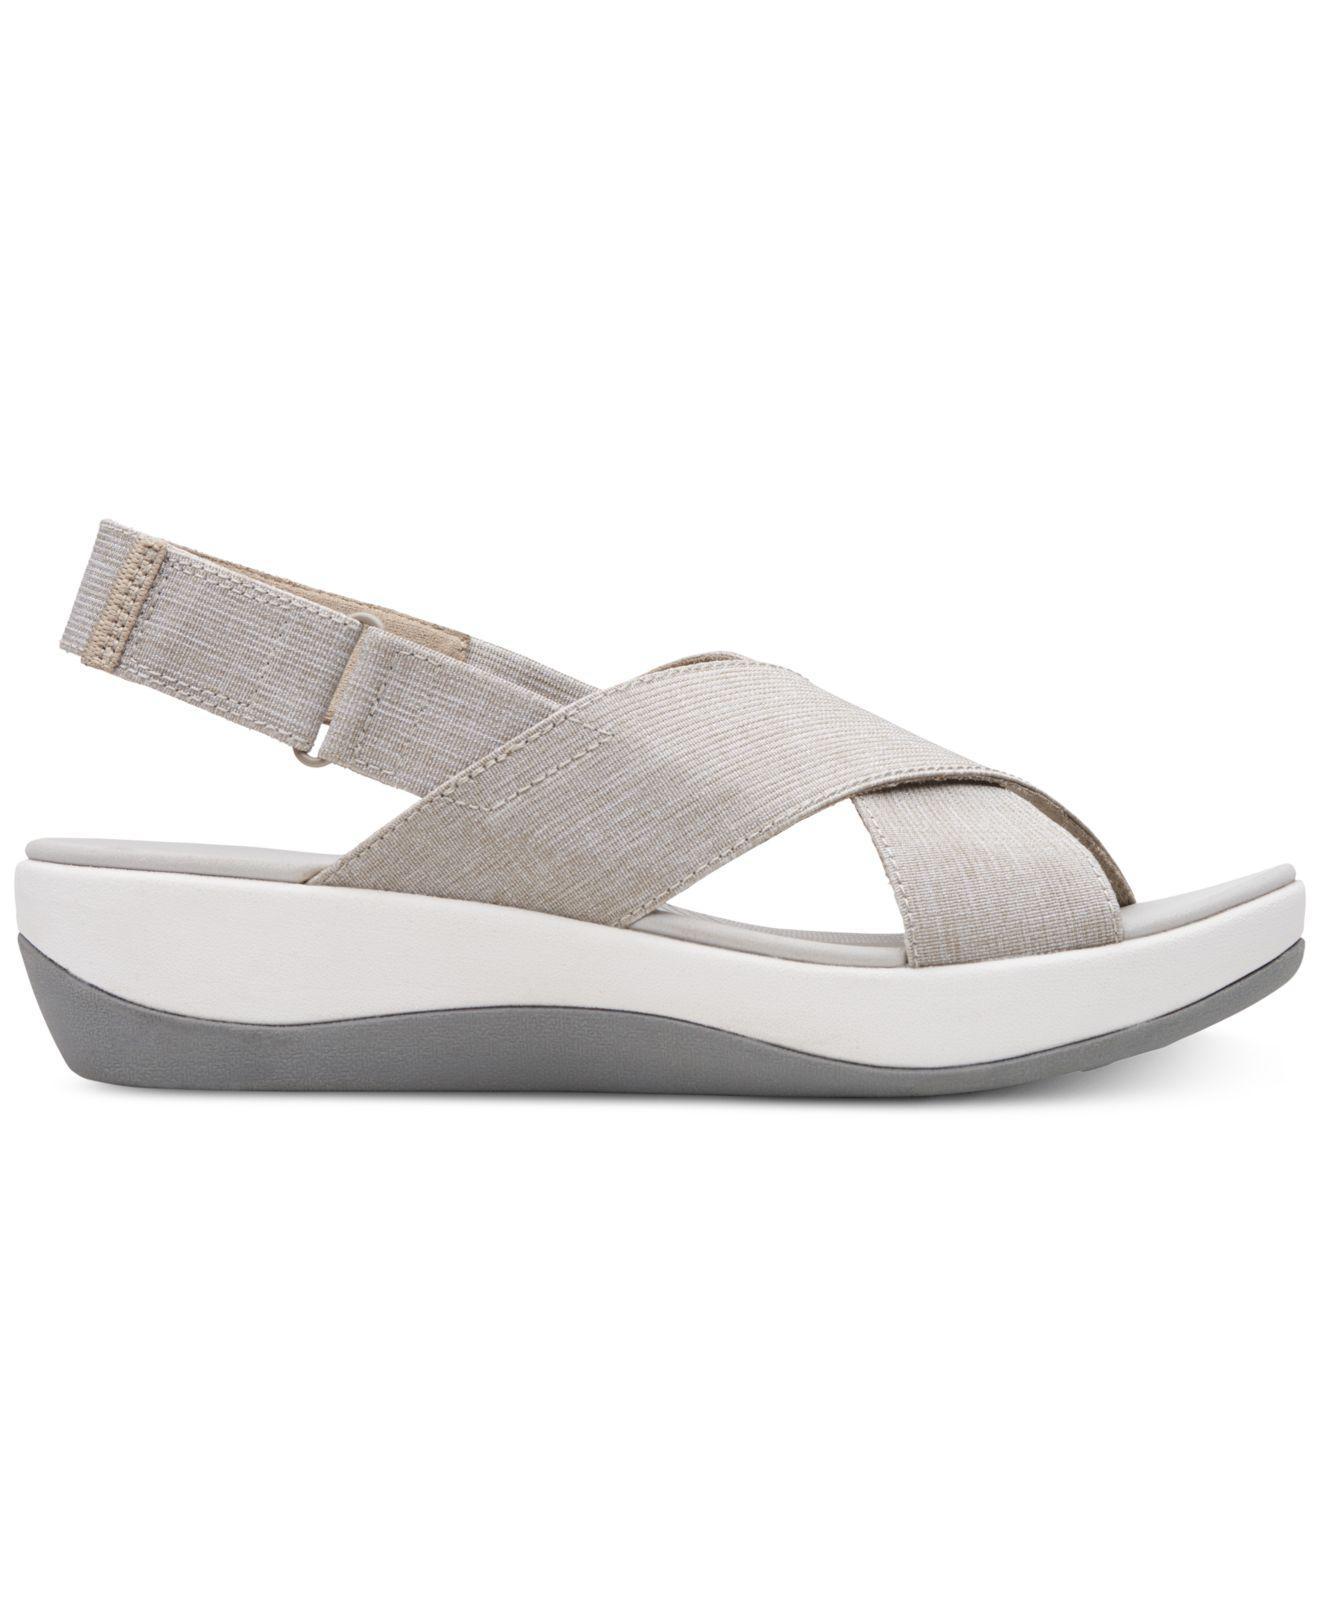 df56a84b900fa3 Lyst - Clarks Arla Kaydin Cloudsteppers Sandals